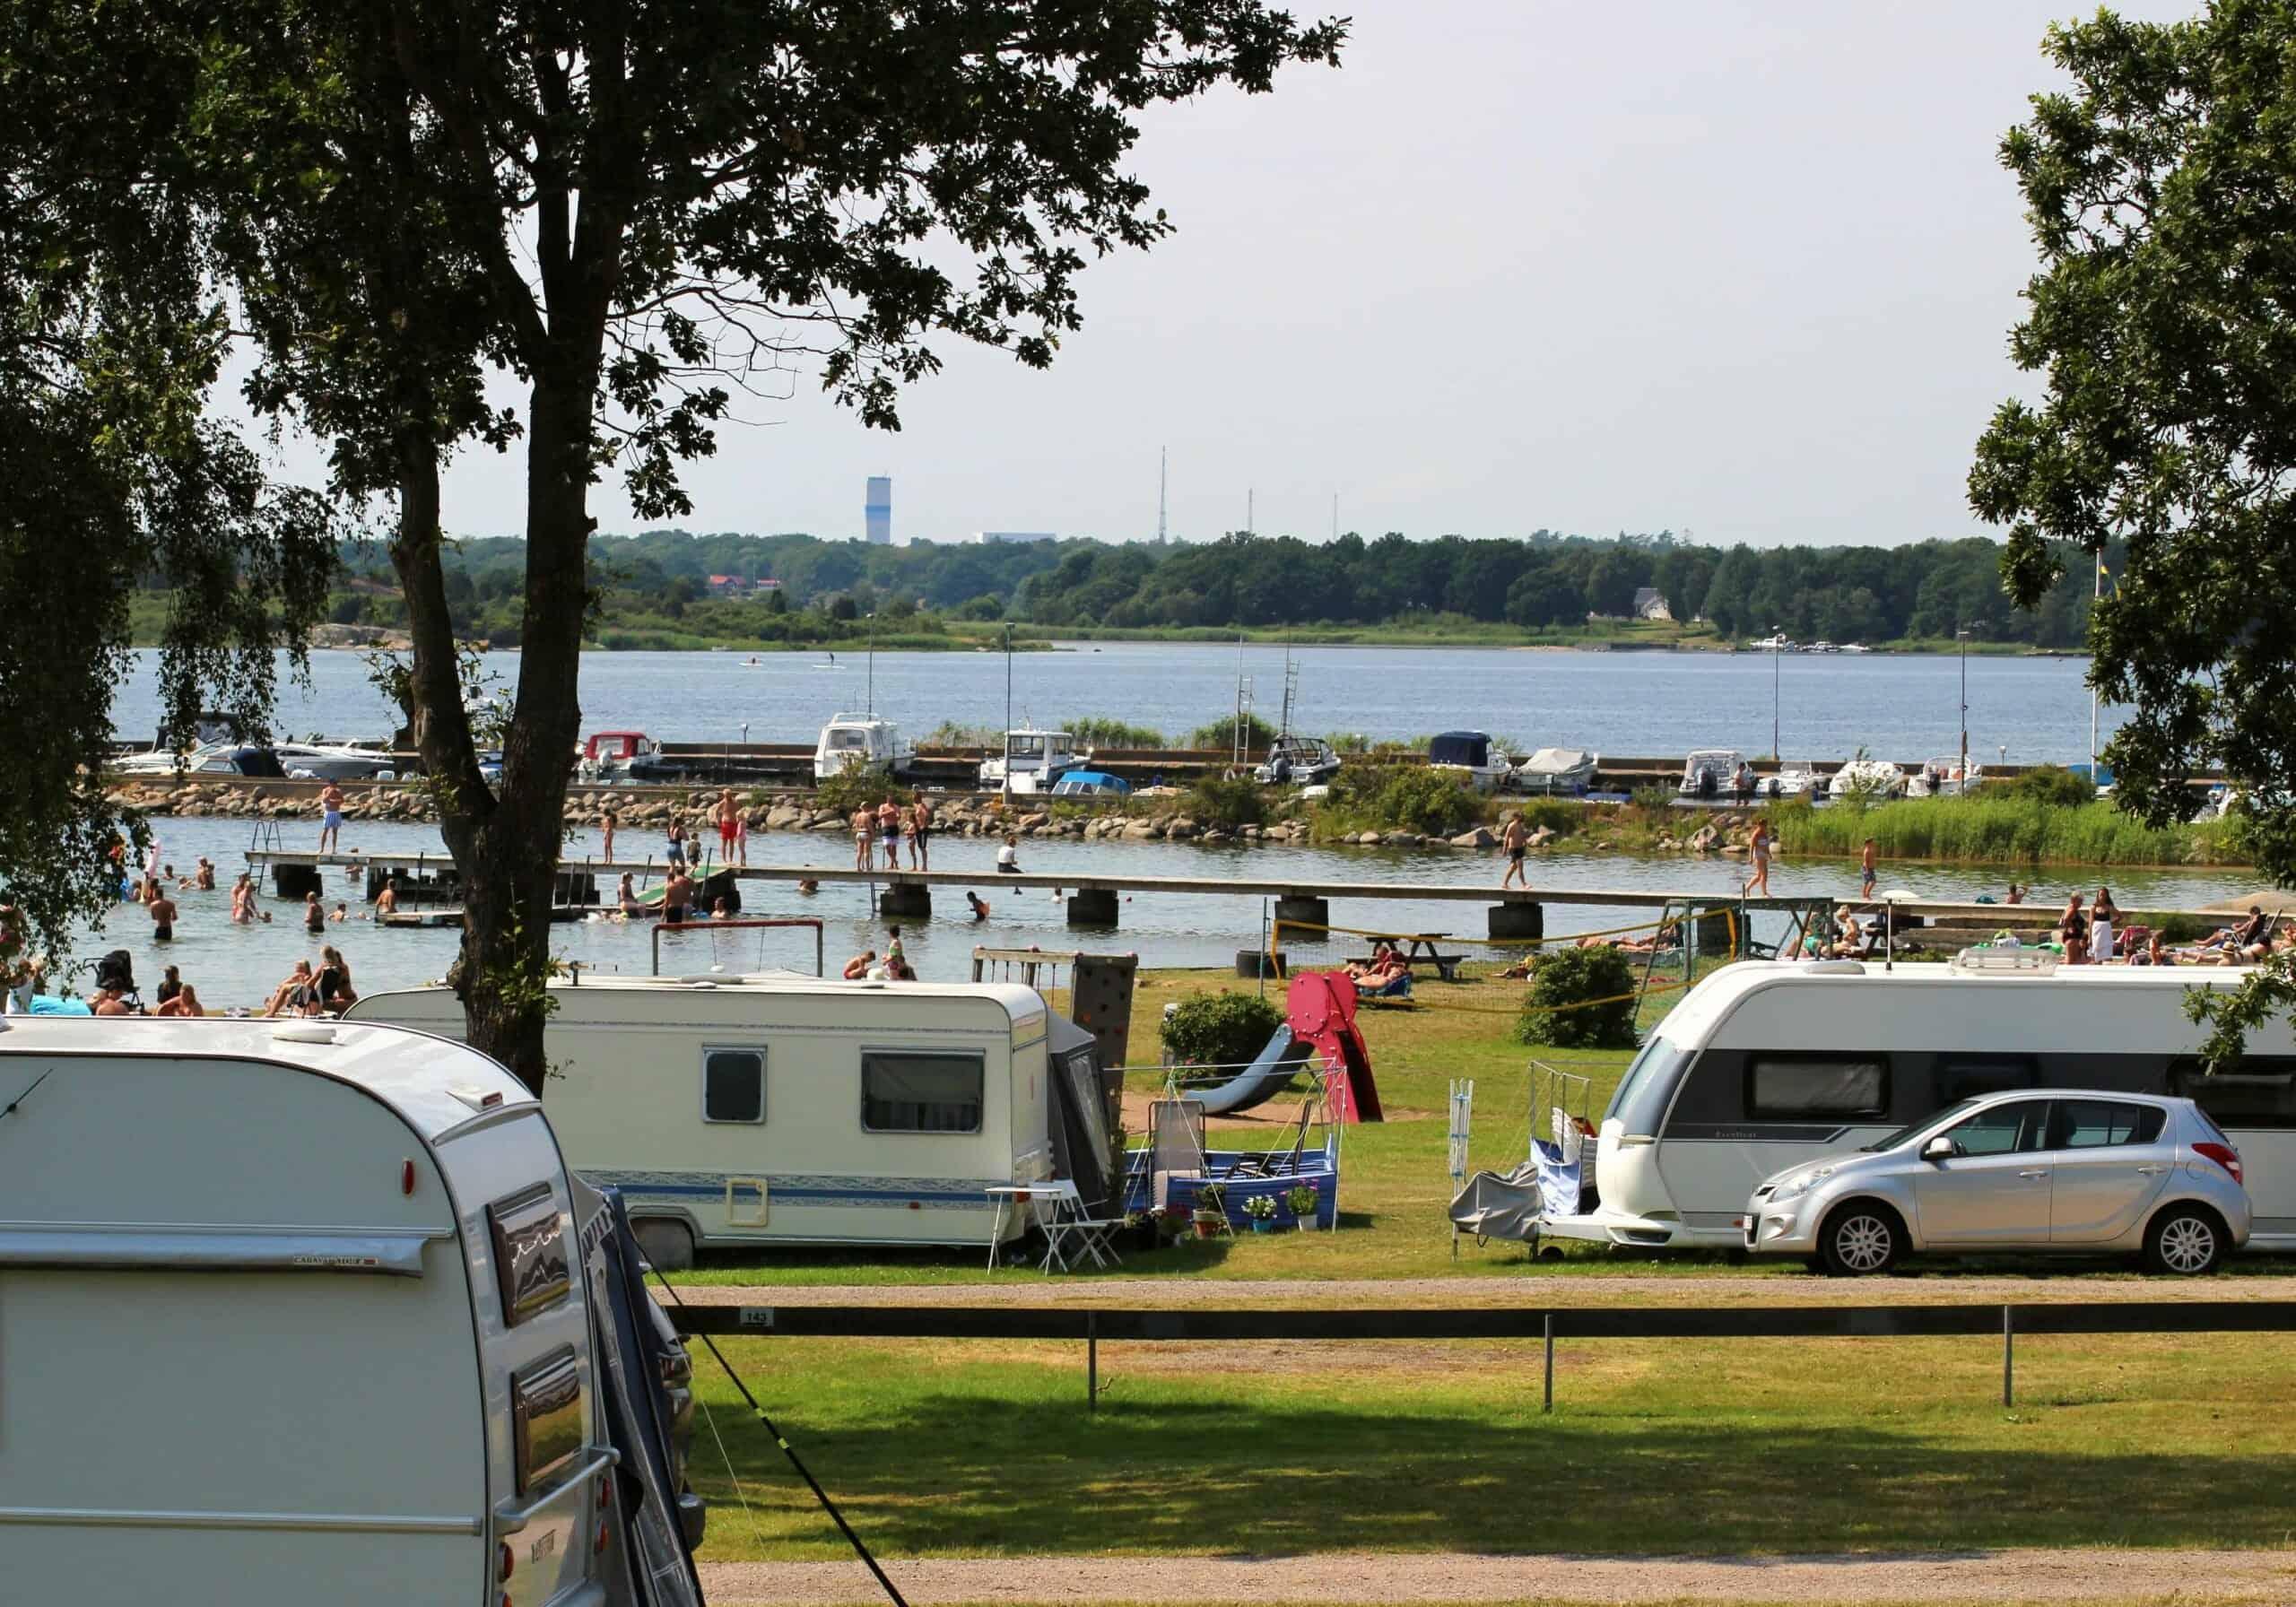 Campingtomt husvagn/husbil blå zon inkl el